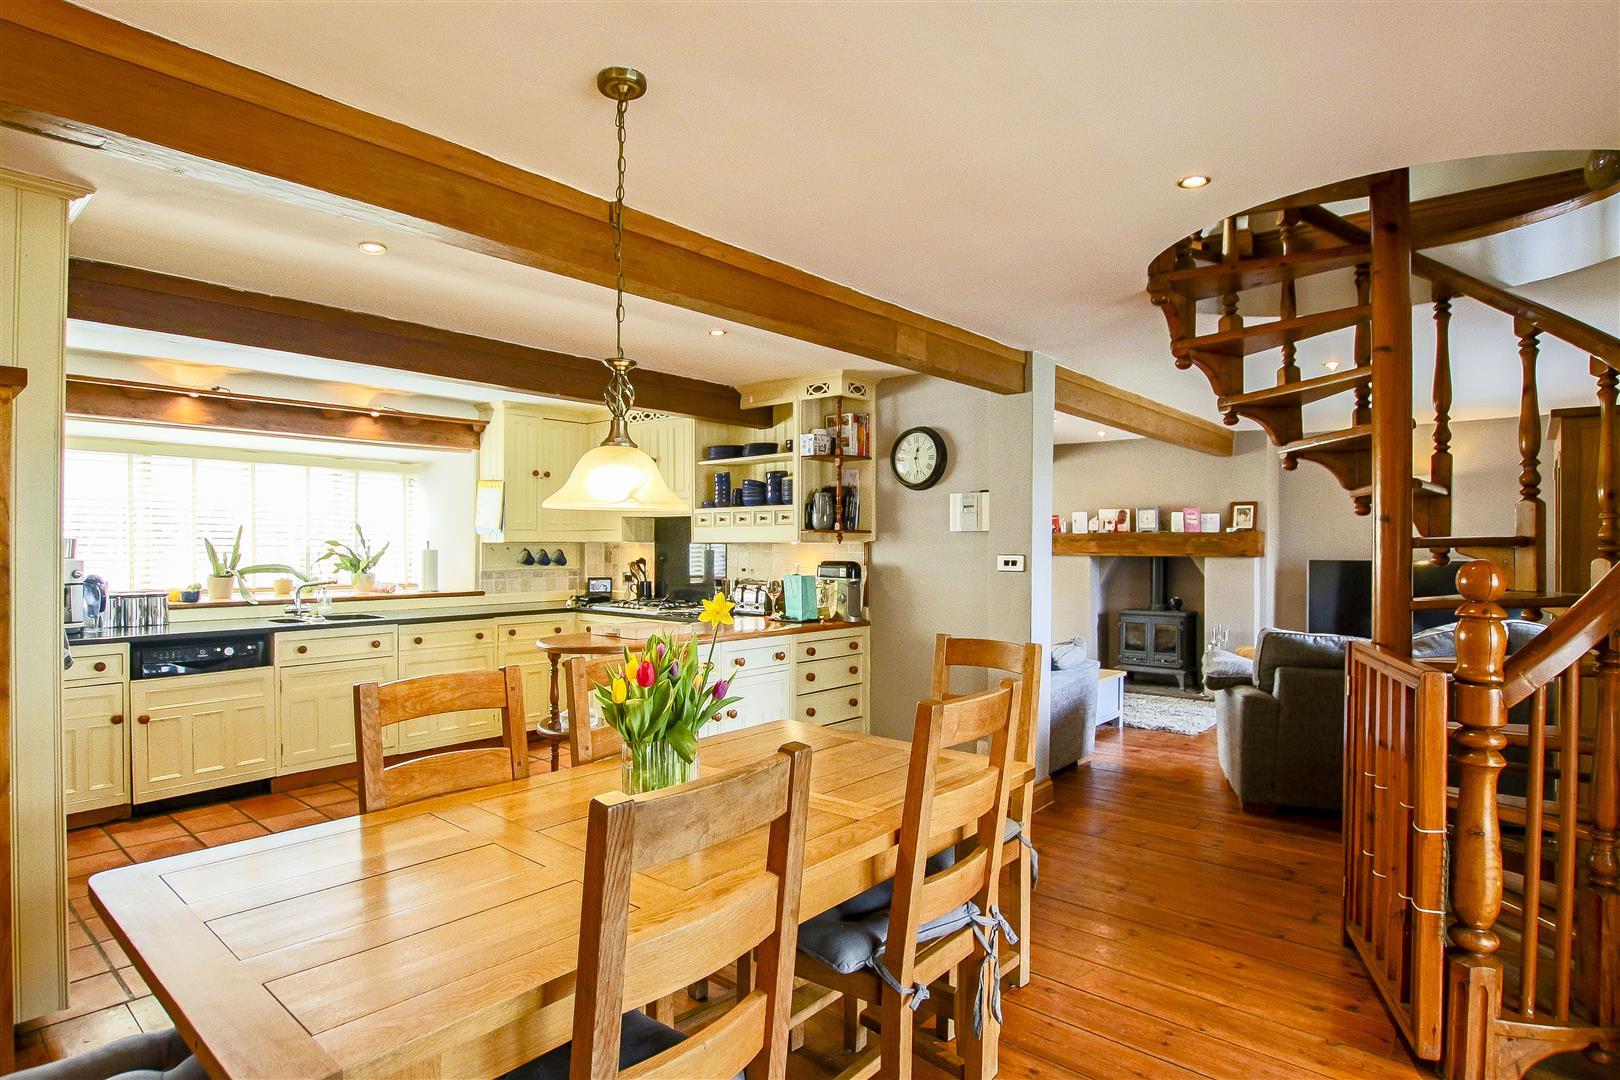 5 Bedroom Barn Conversion For Sale - 9.jpg